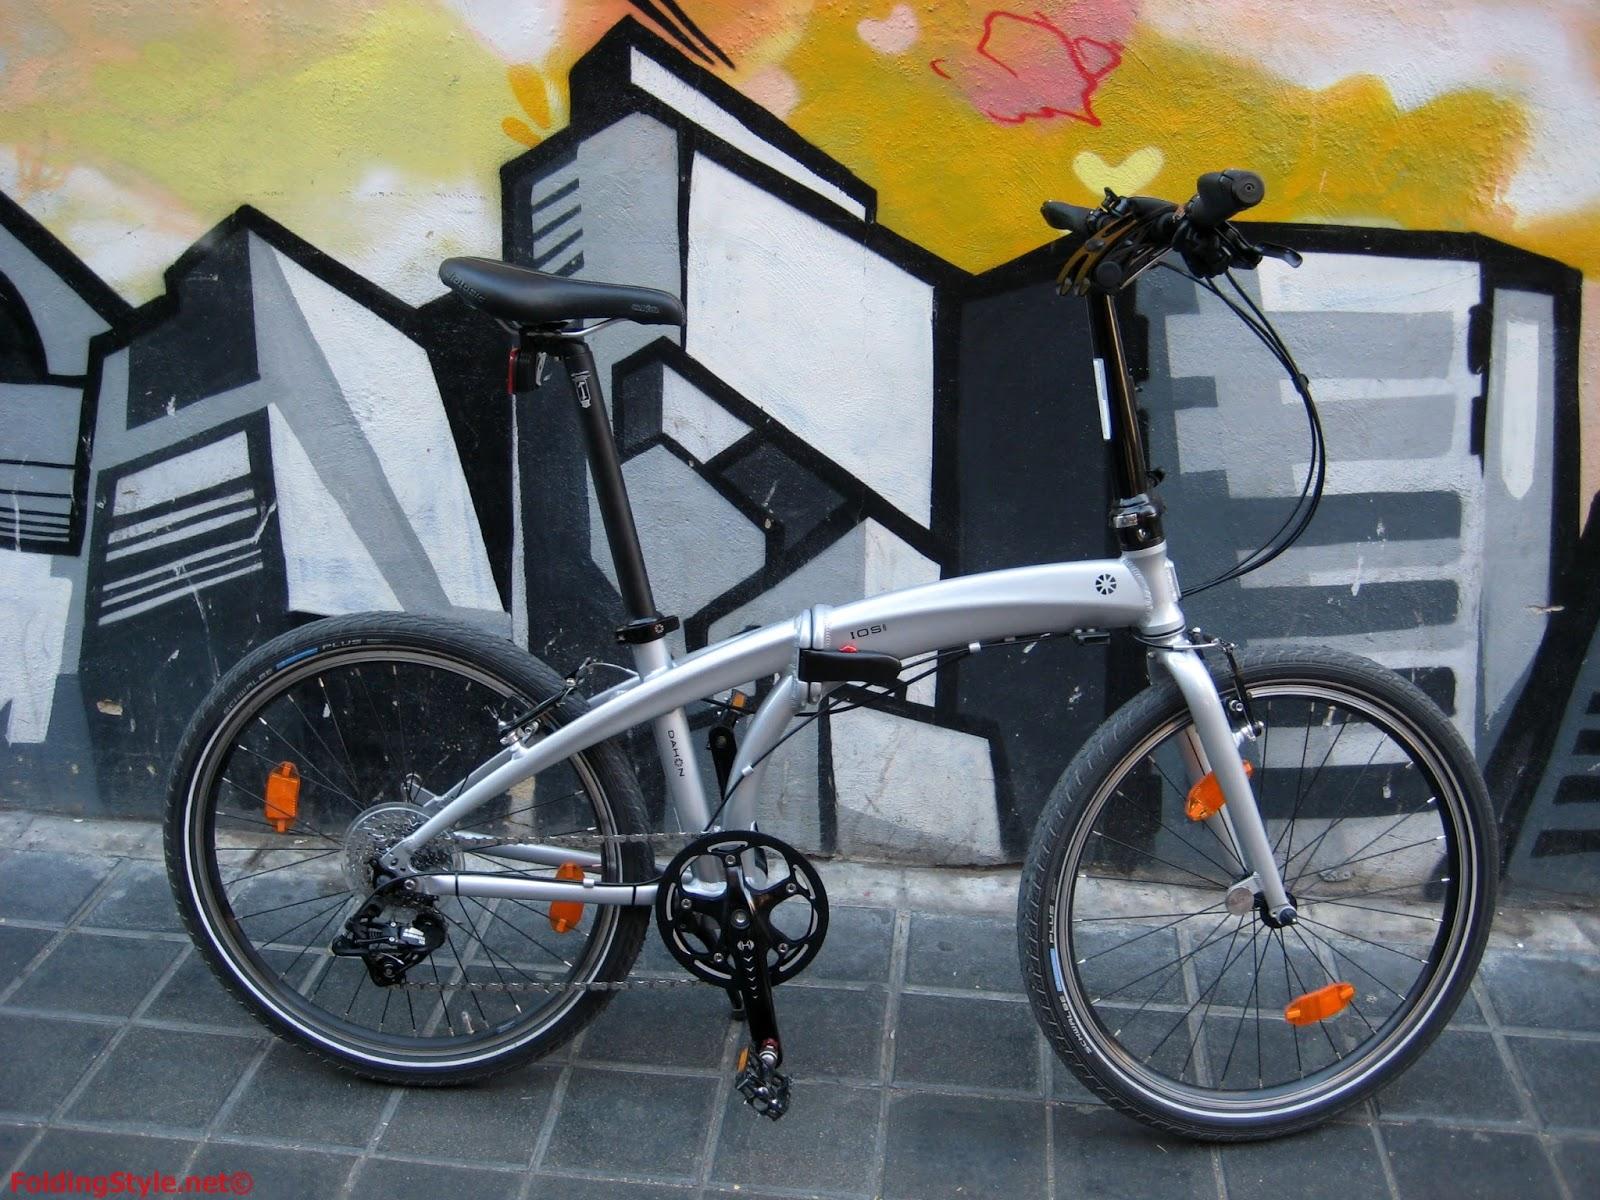 Dahon Ios P8 Folding Bike Harga: Rp. 6.600.000,- - Toko